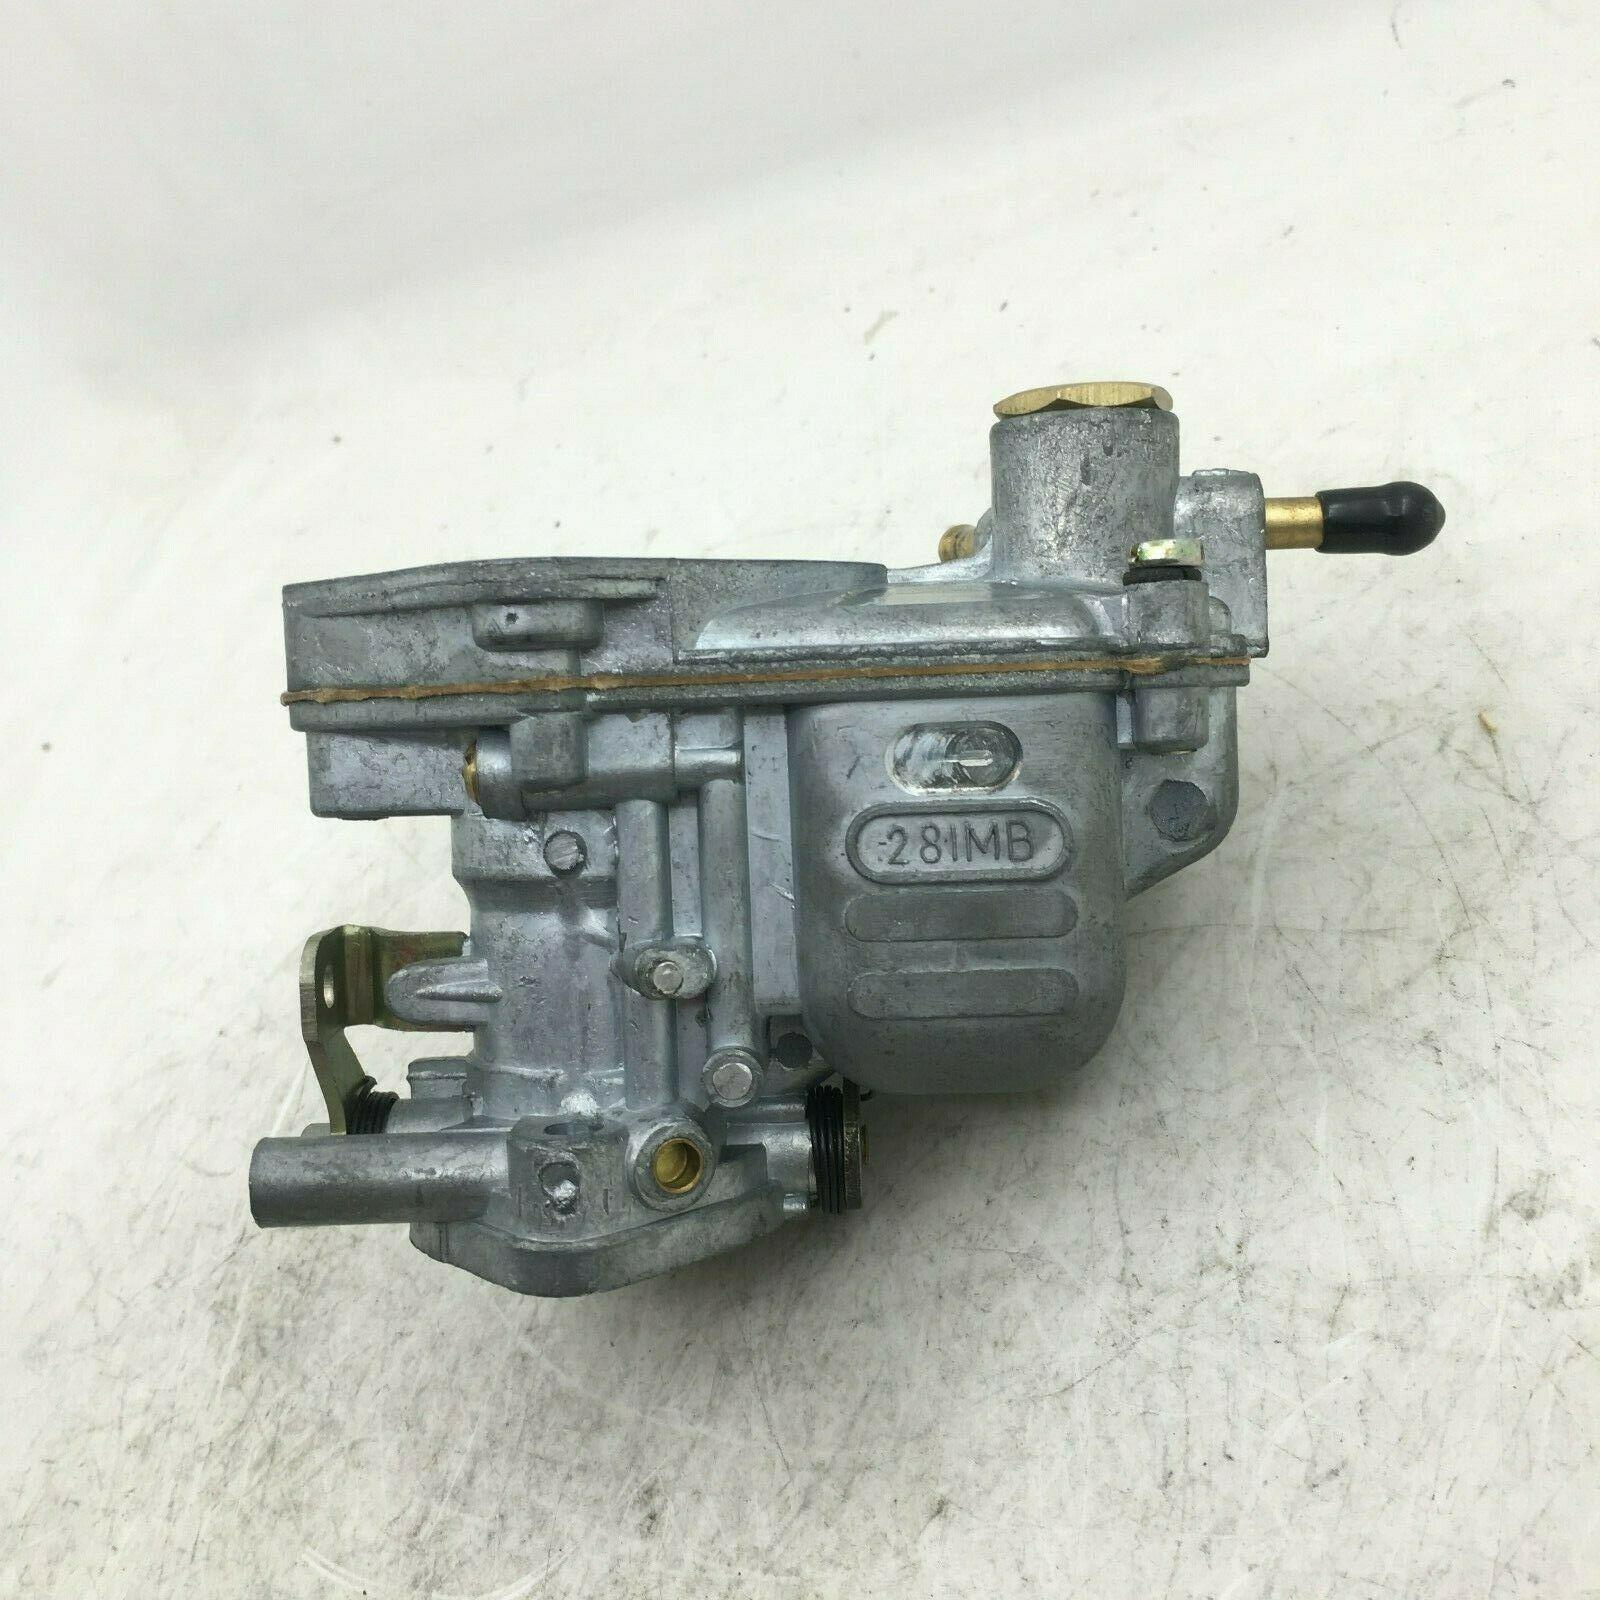 Carb Carburetor Classic For Fiat 500 126 Rep Weber Type 28 Imb 5 250 4381128 652cc Buy Carburetor For Fiat 500 126 Carburetor Rep Weber Carburetor Type 28 Imb Product On Alibaba Com